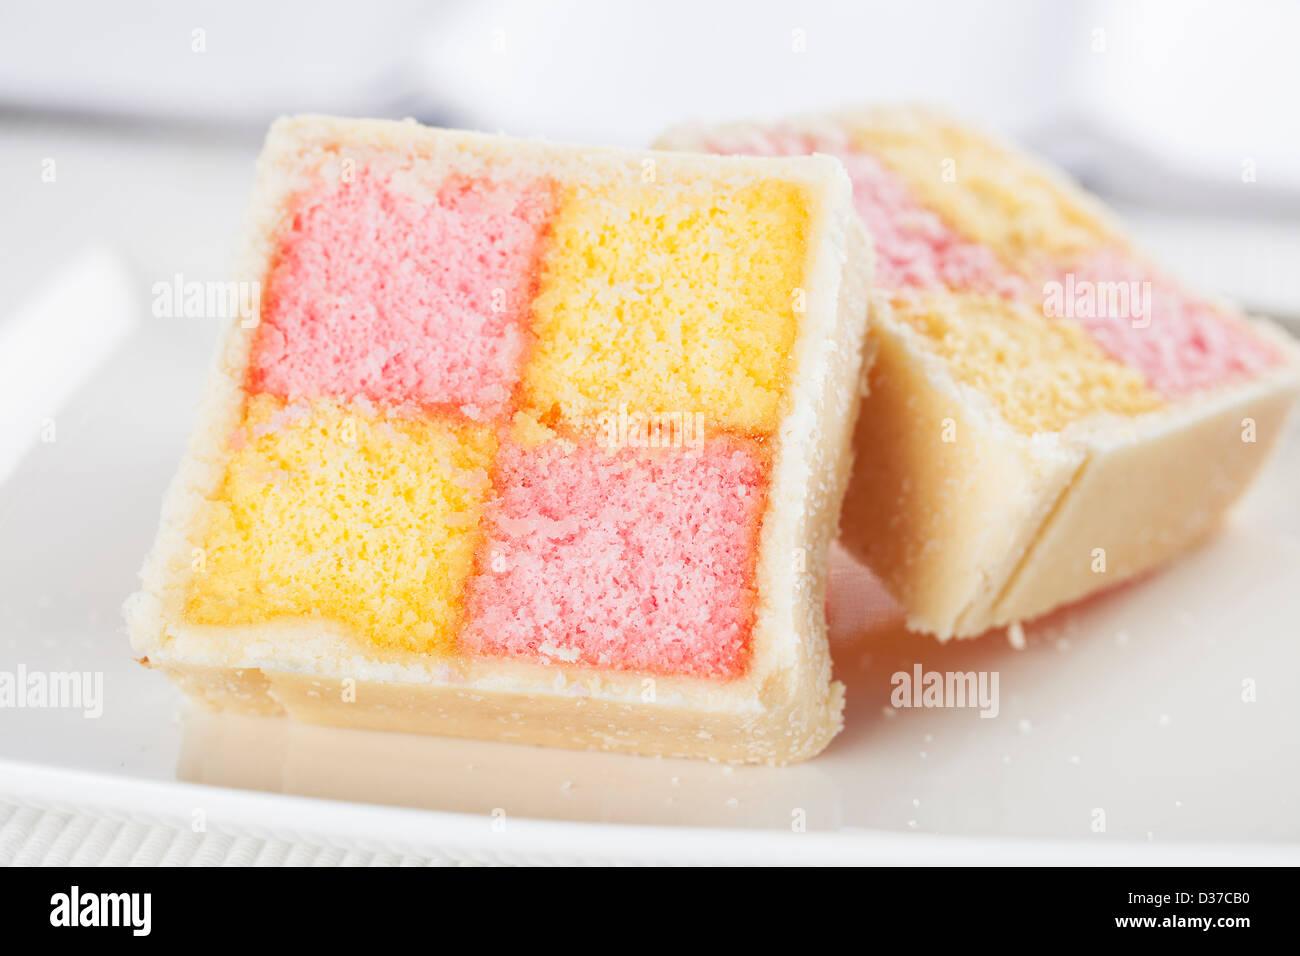 Battenburg cake for afternoon tea - Stock Image